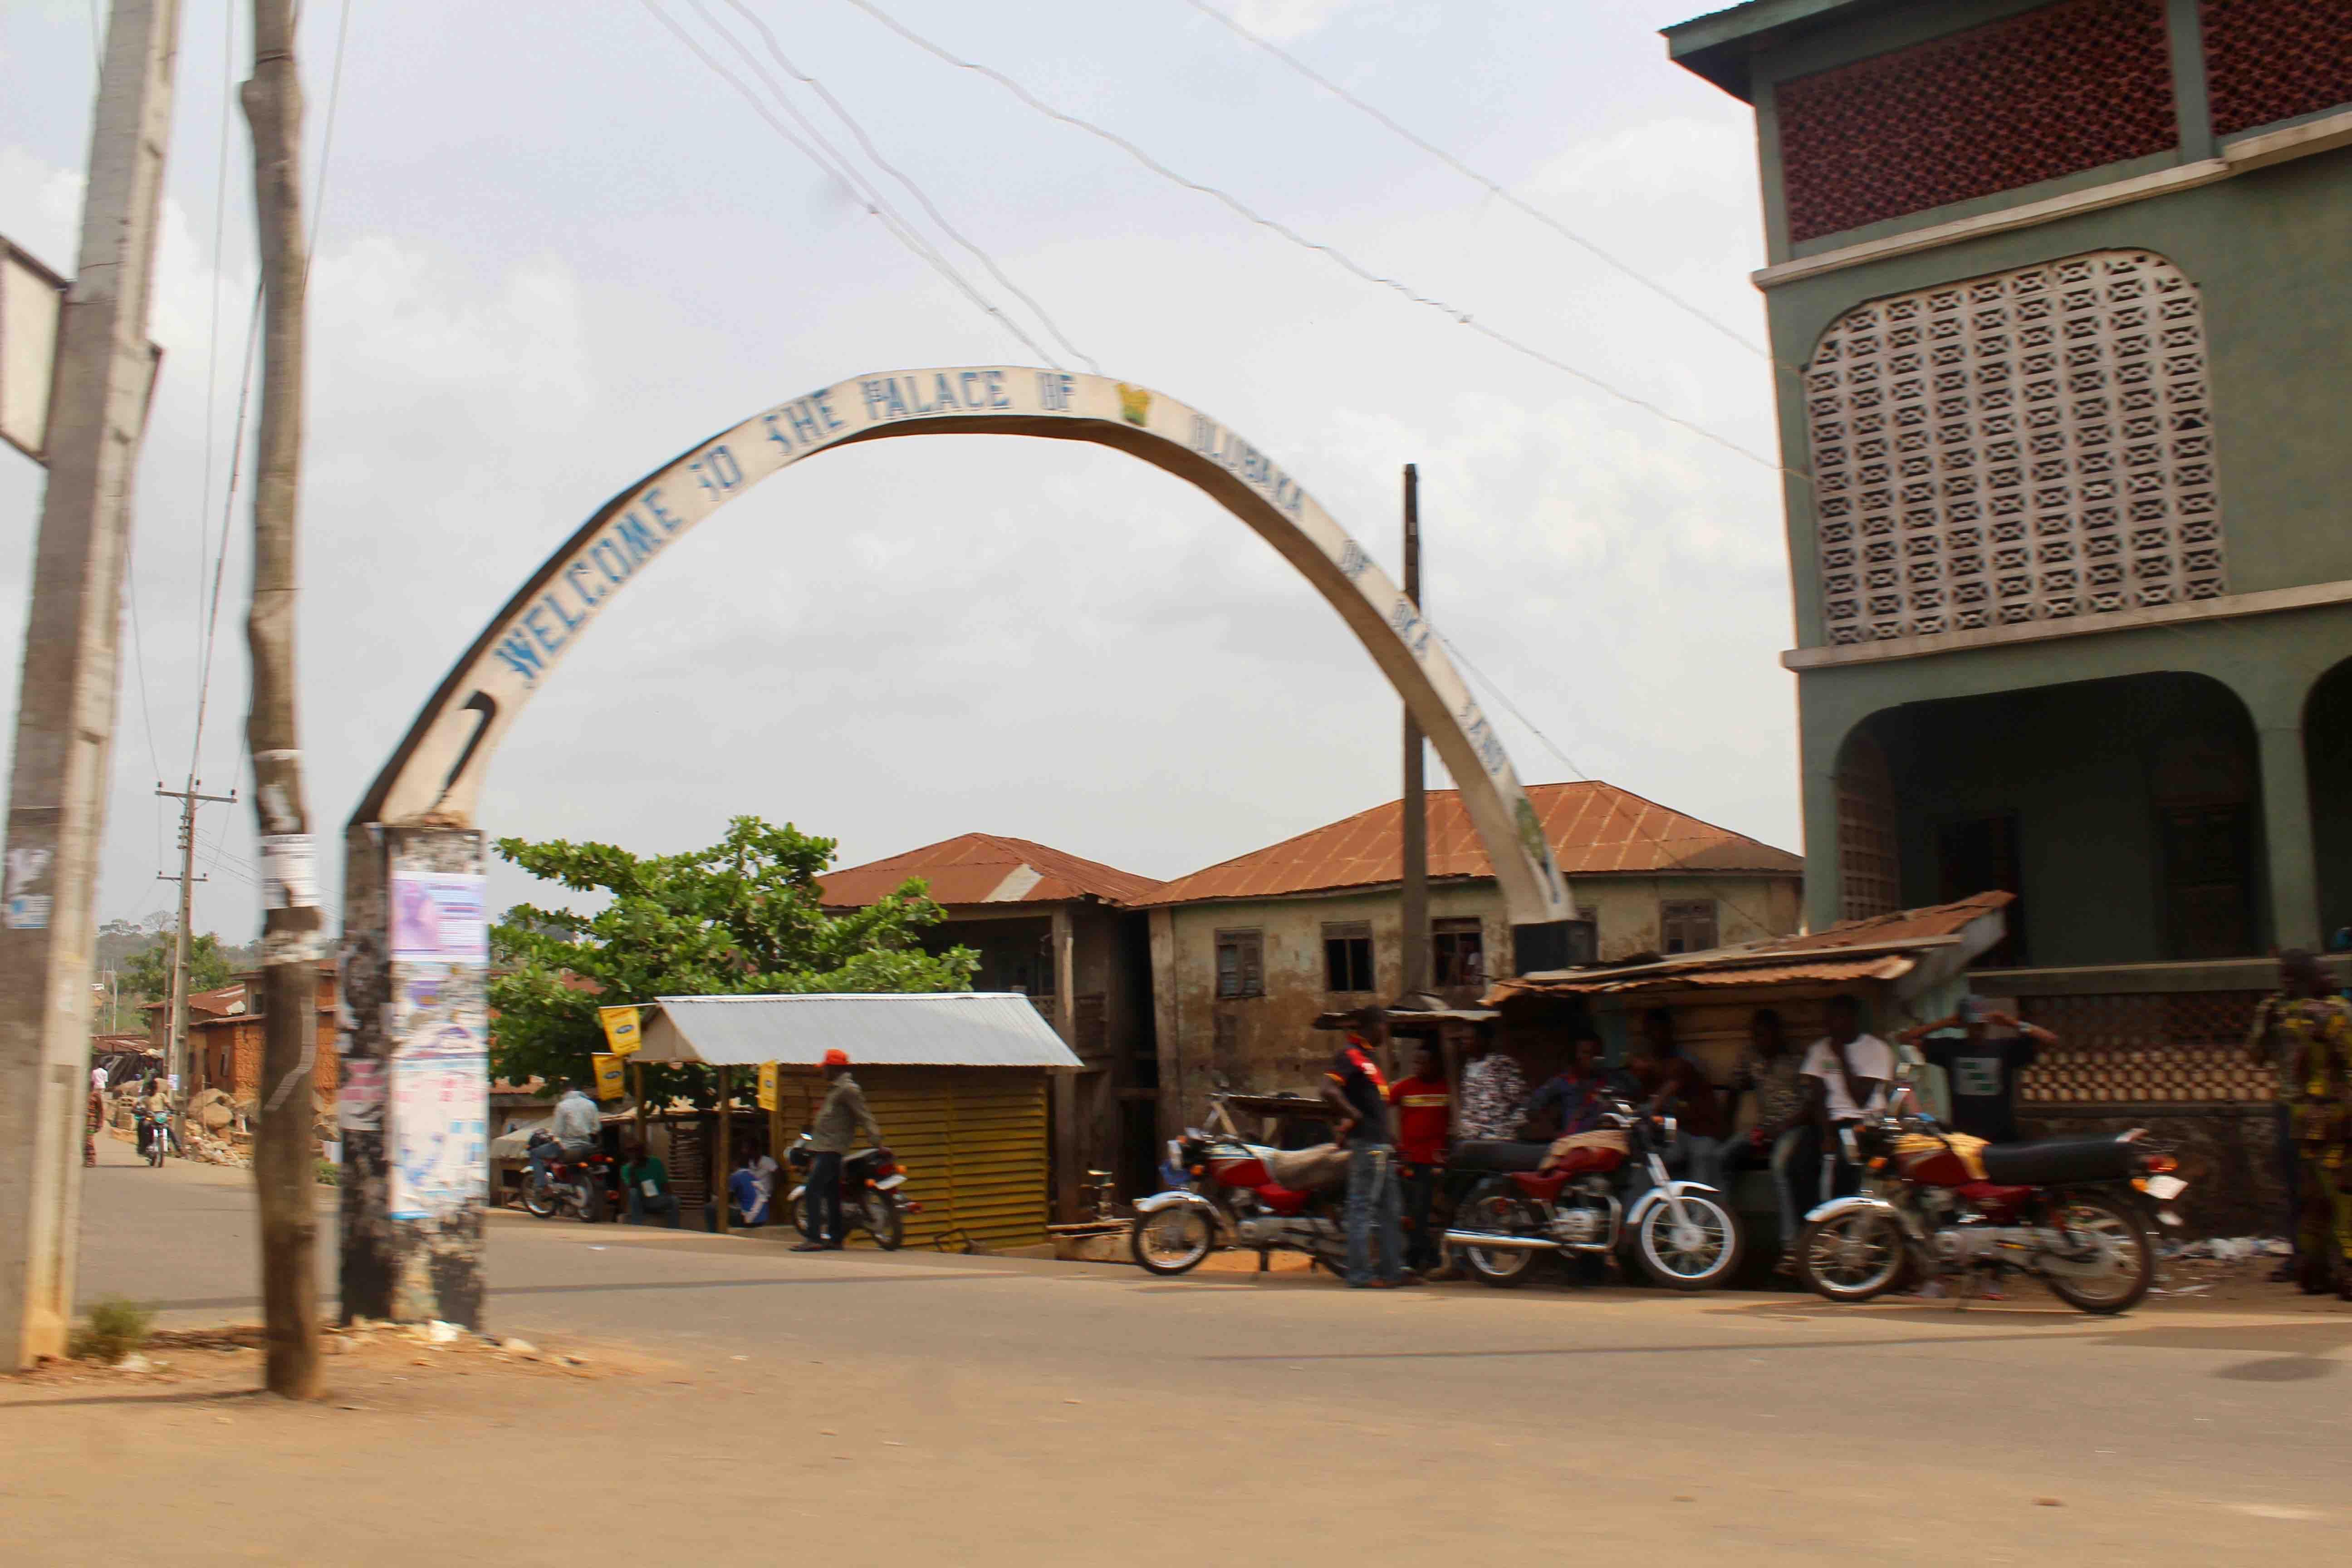 Palace of The Olubaka of Oka, Oka Akoko, Ondo State, Nigeria. #JujuFilms